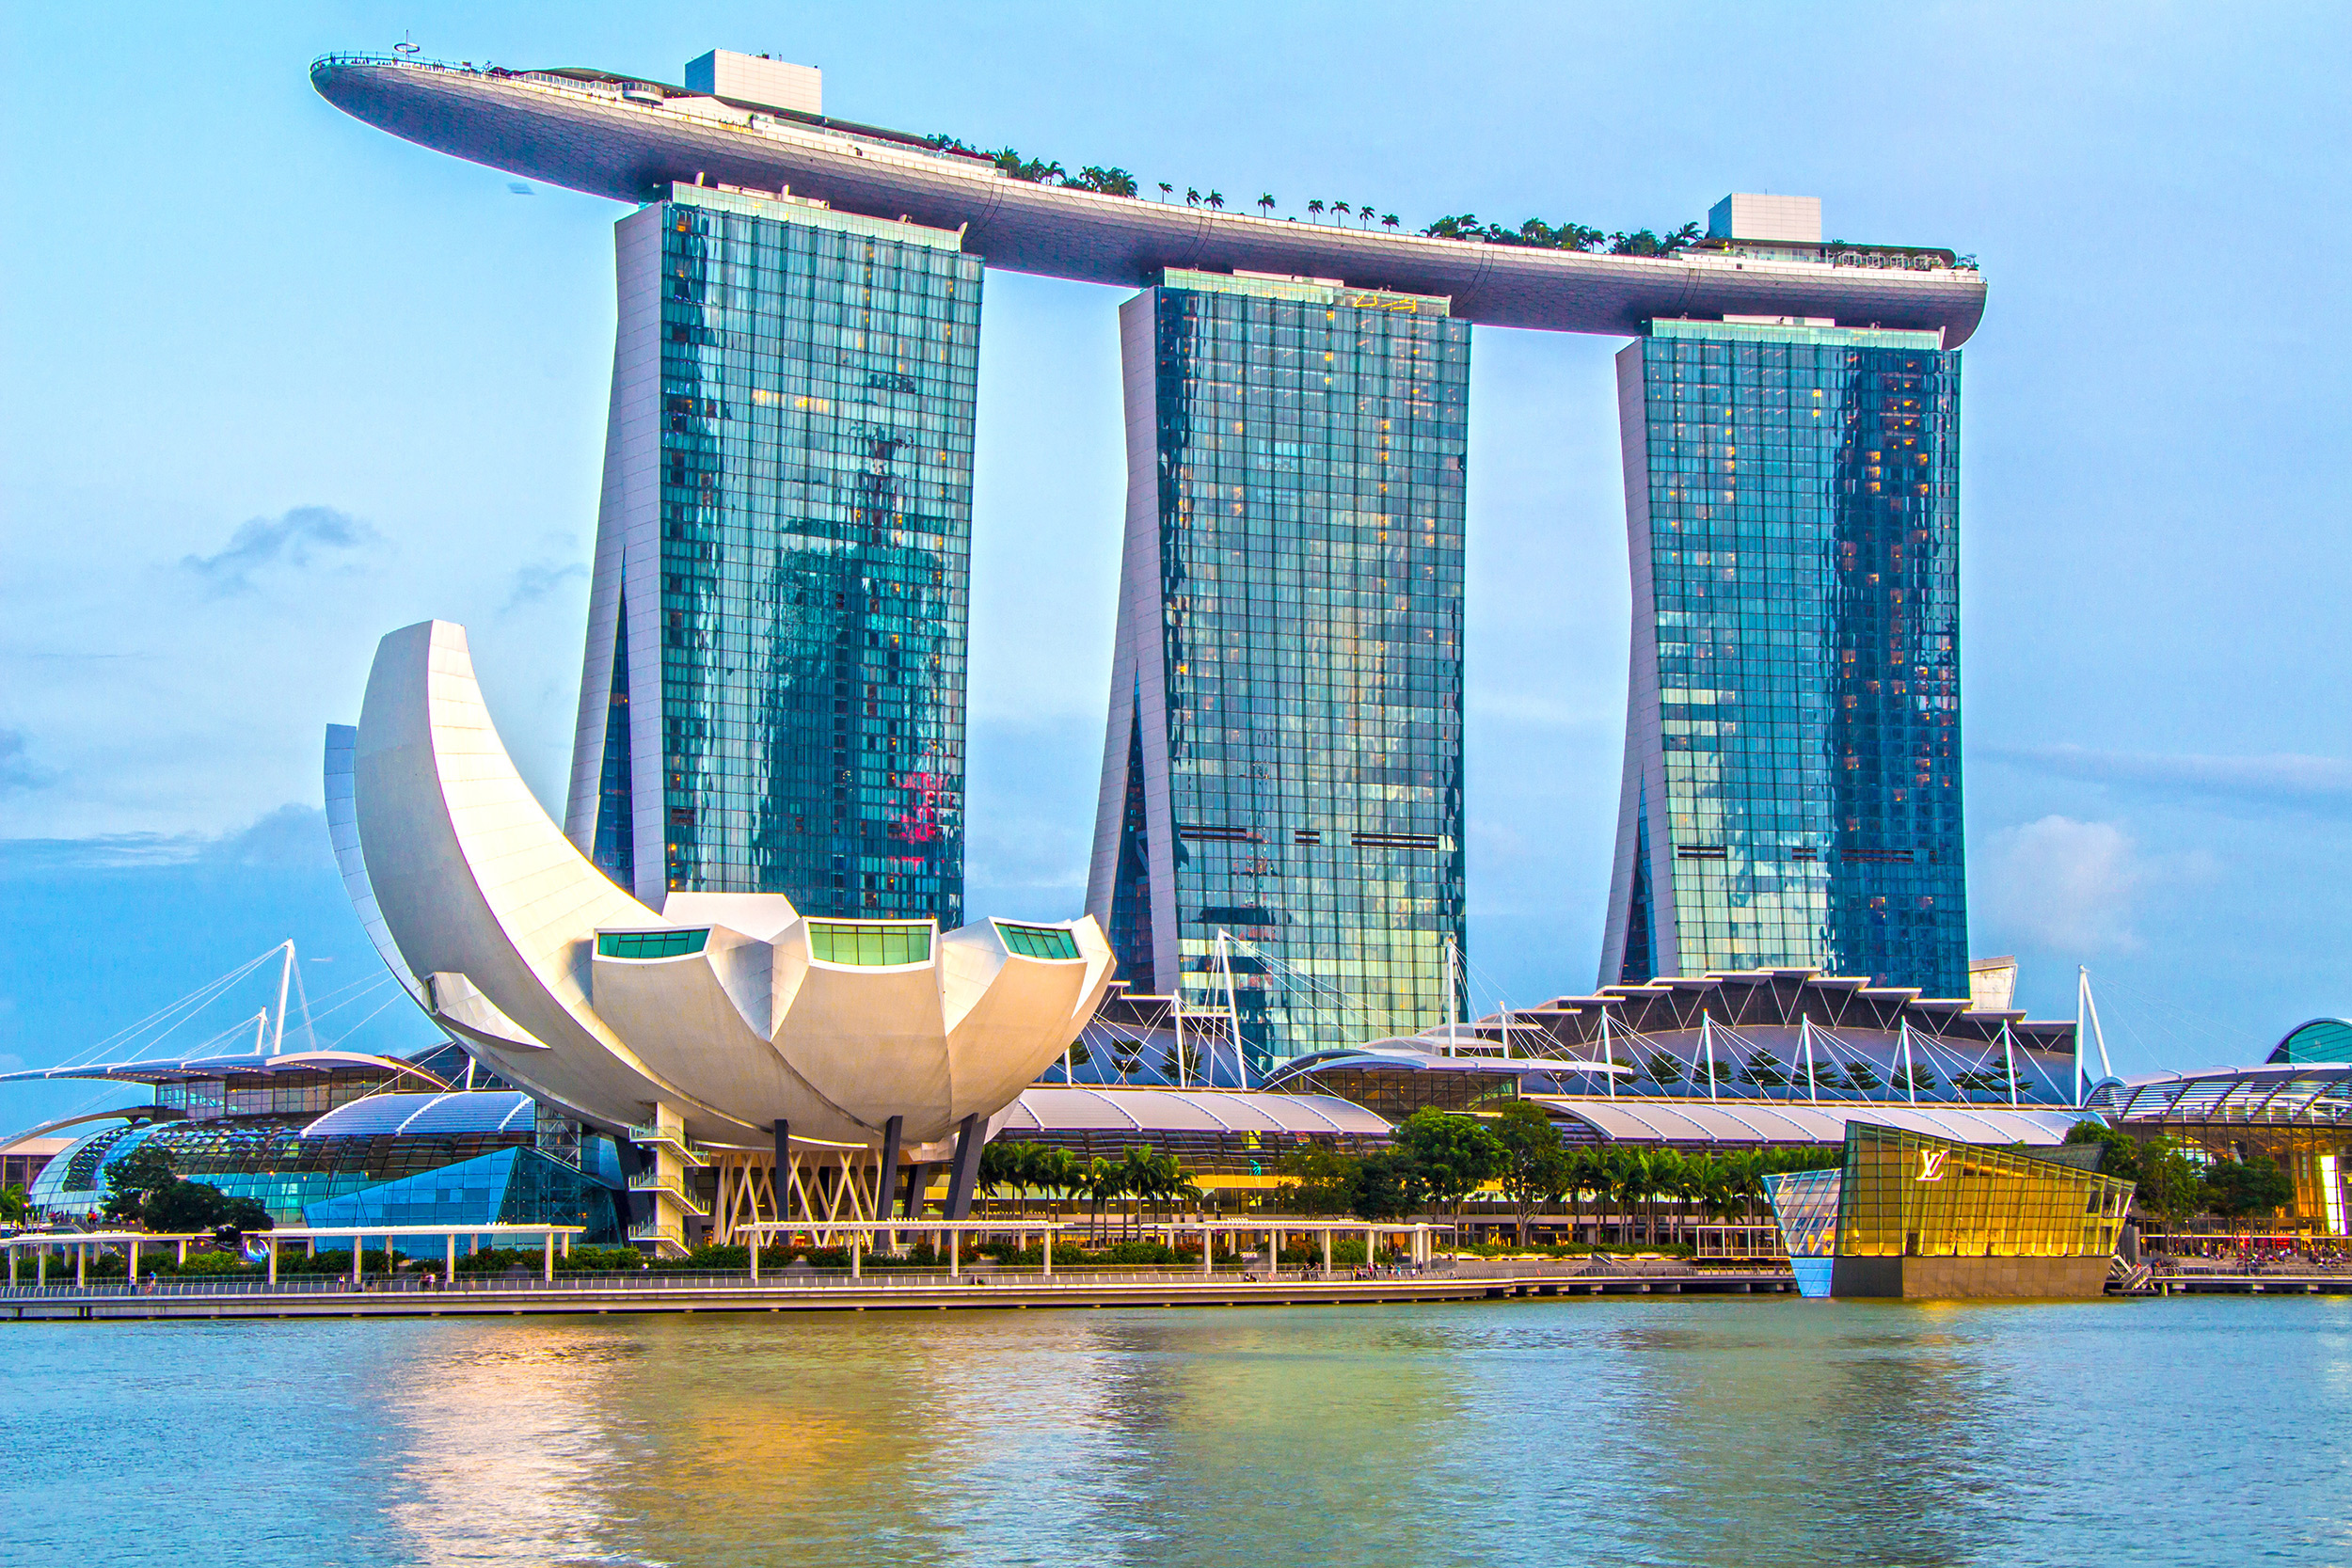 Award Hotel 7 Tage Im Luxuriosen 5 Marina Bay Sands In Singapur